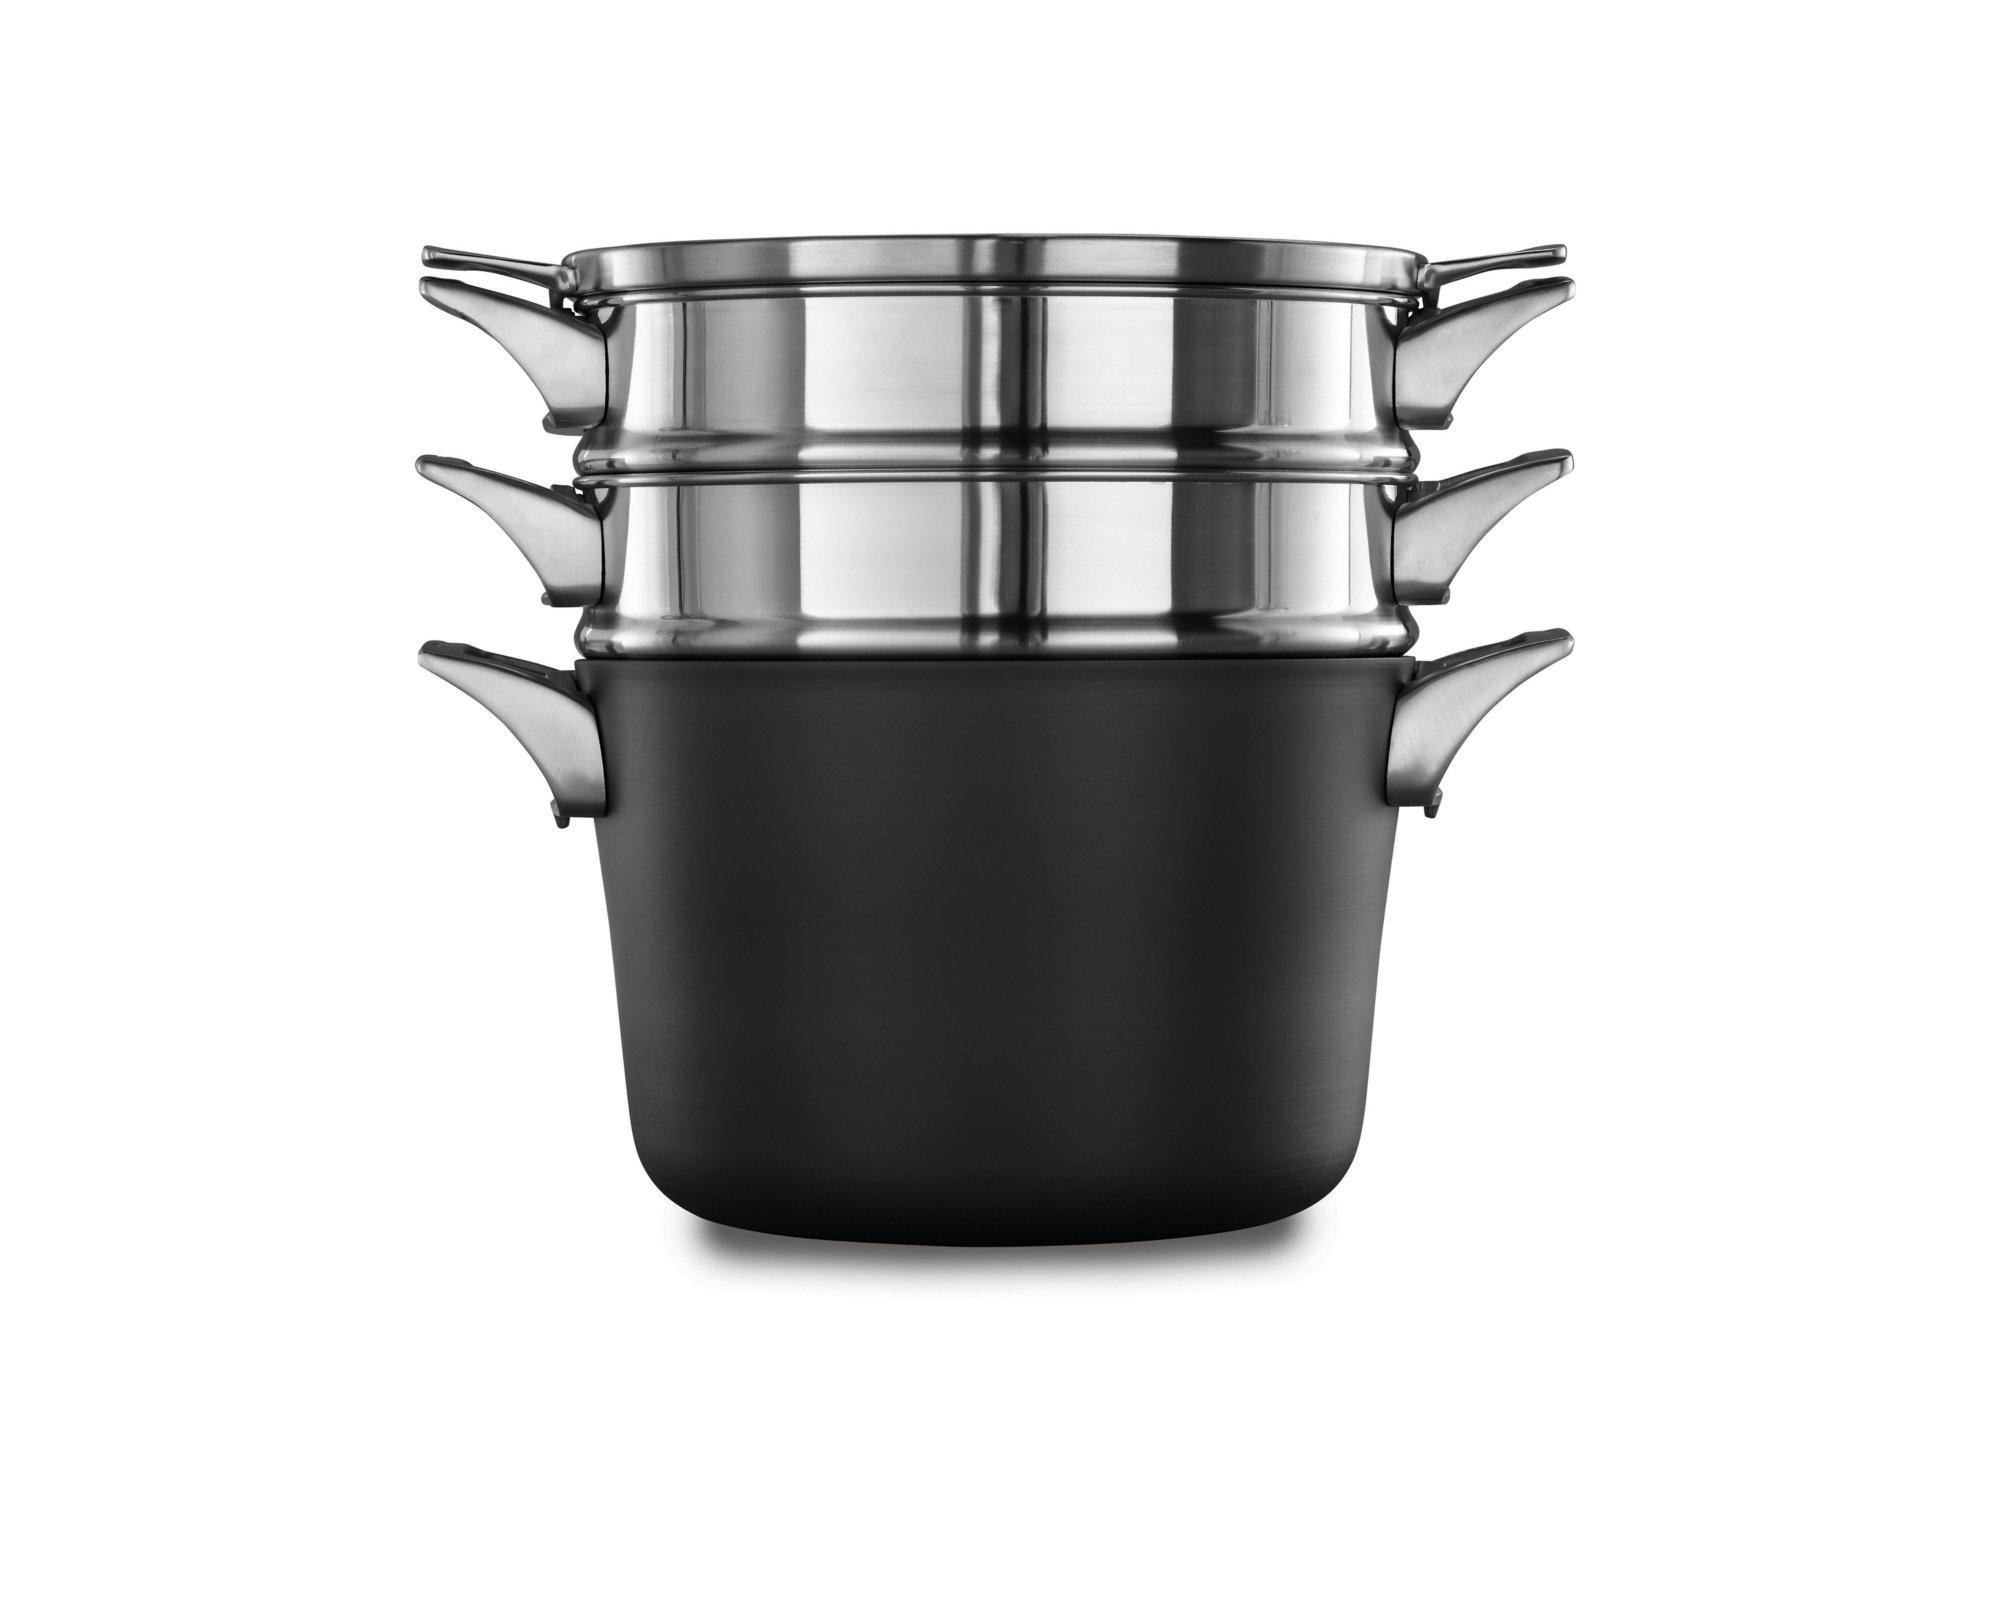 Calphalon Premier Space-Saving Hard-Anodized Nonstick Cookware, 8-Quart Multi-Pot